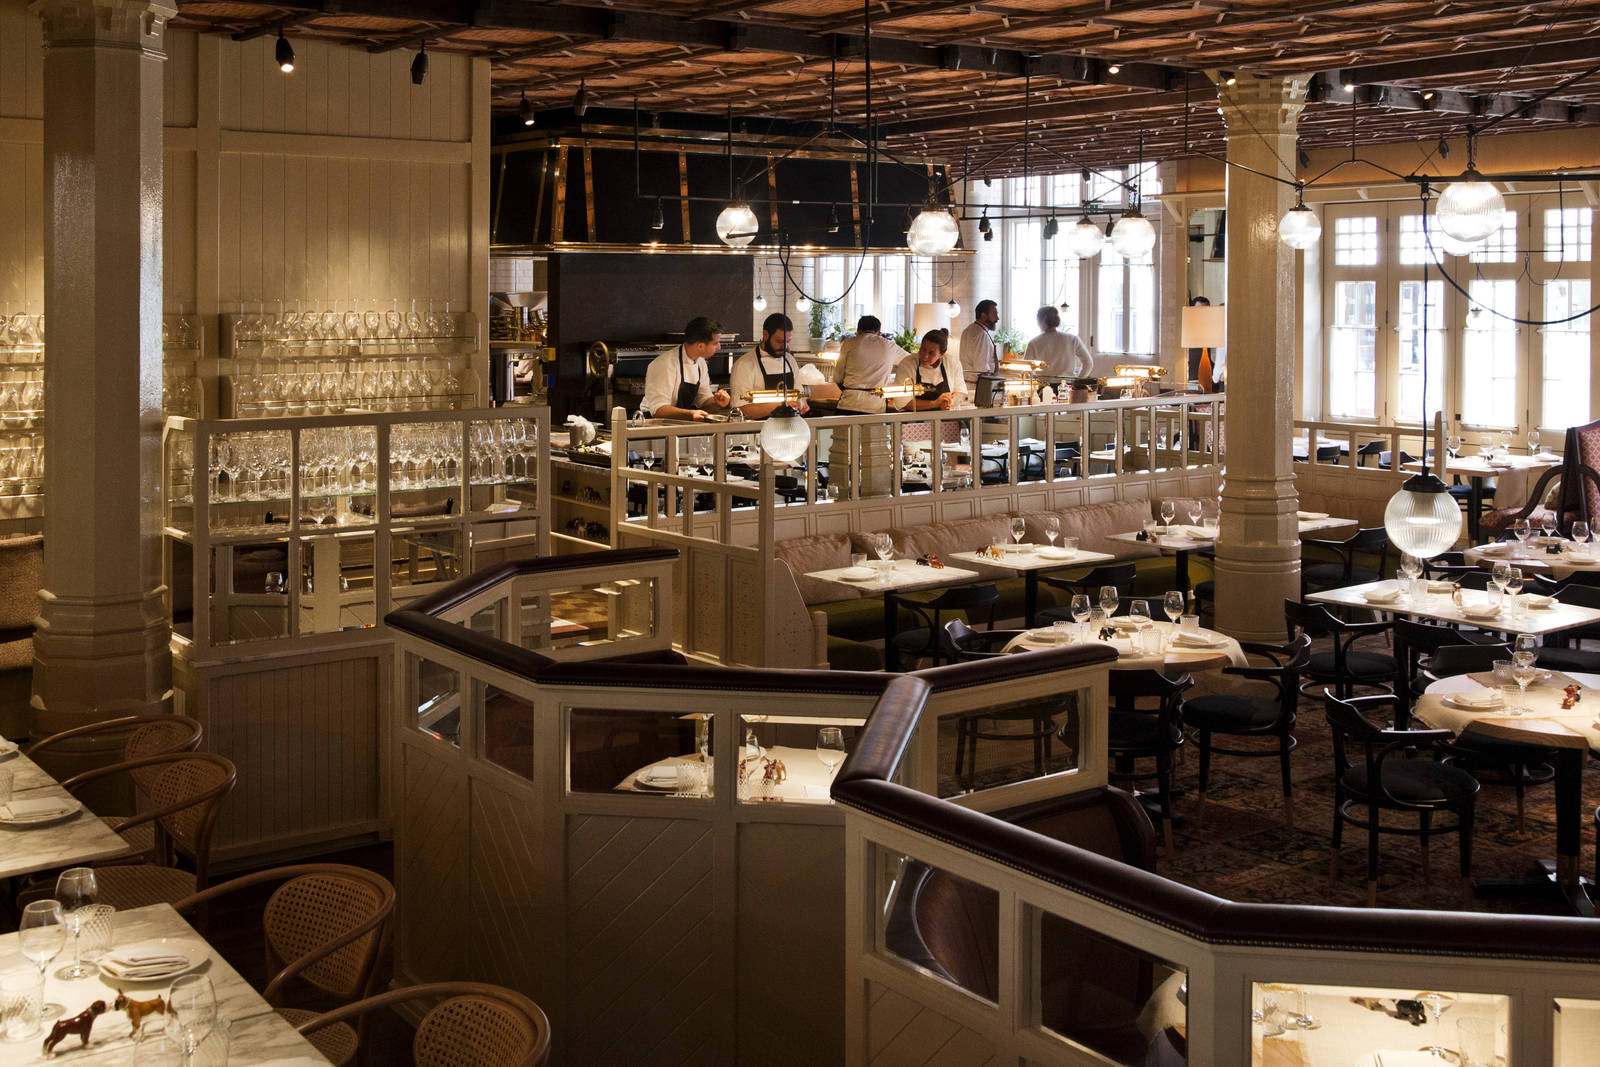 Restaurante Chiltern Firehouse - Onde comer e beber em Londres